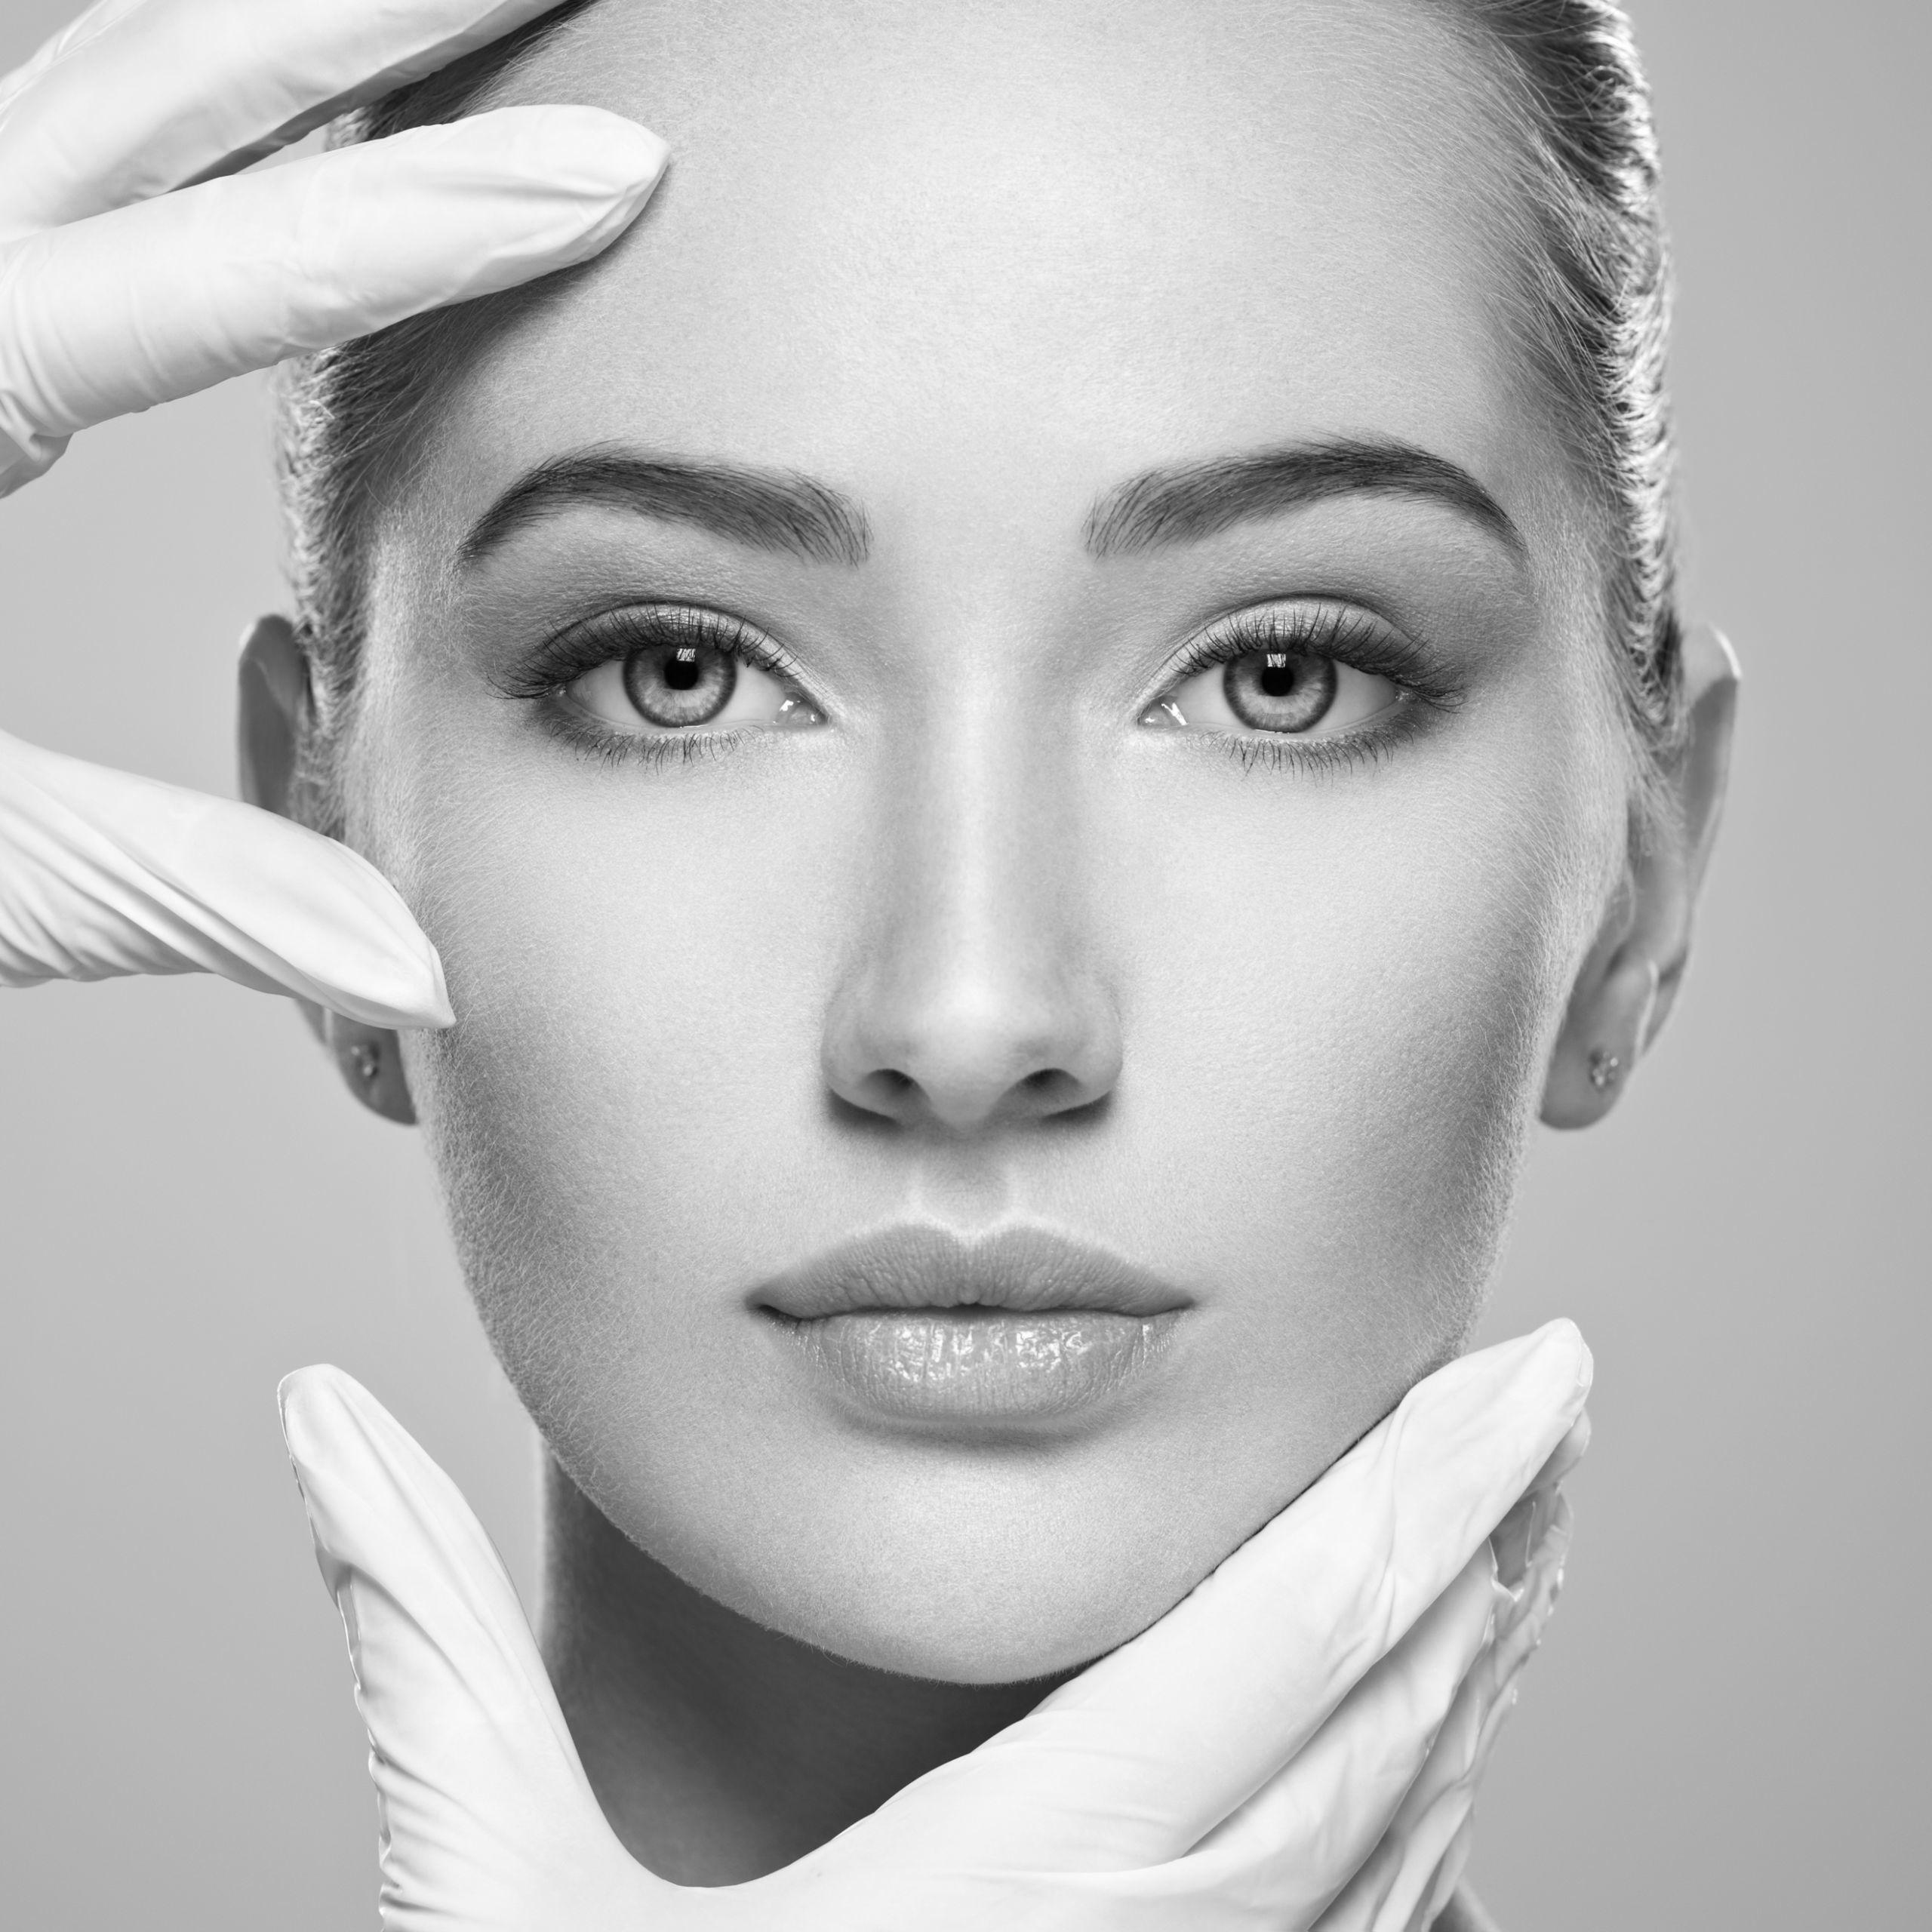 chirurgie du visage suisse romande